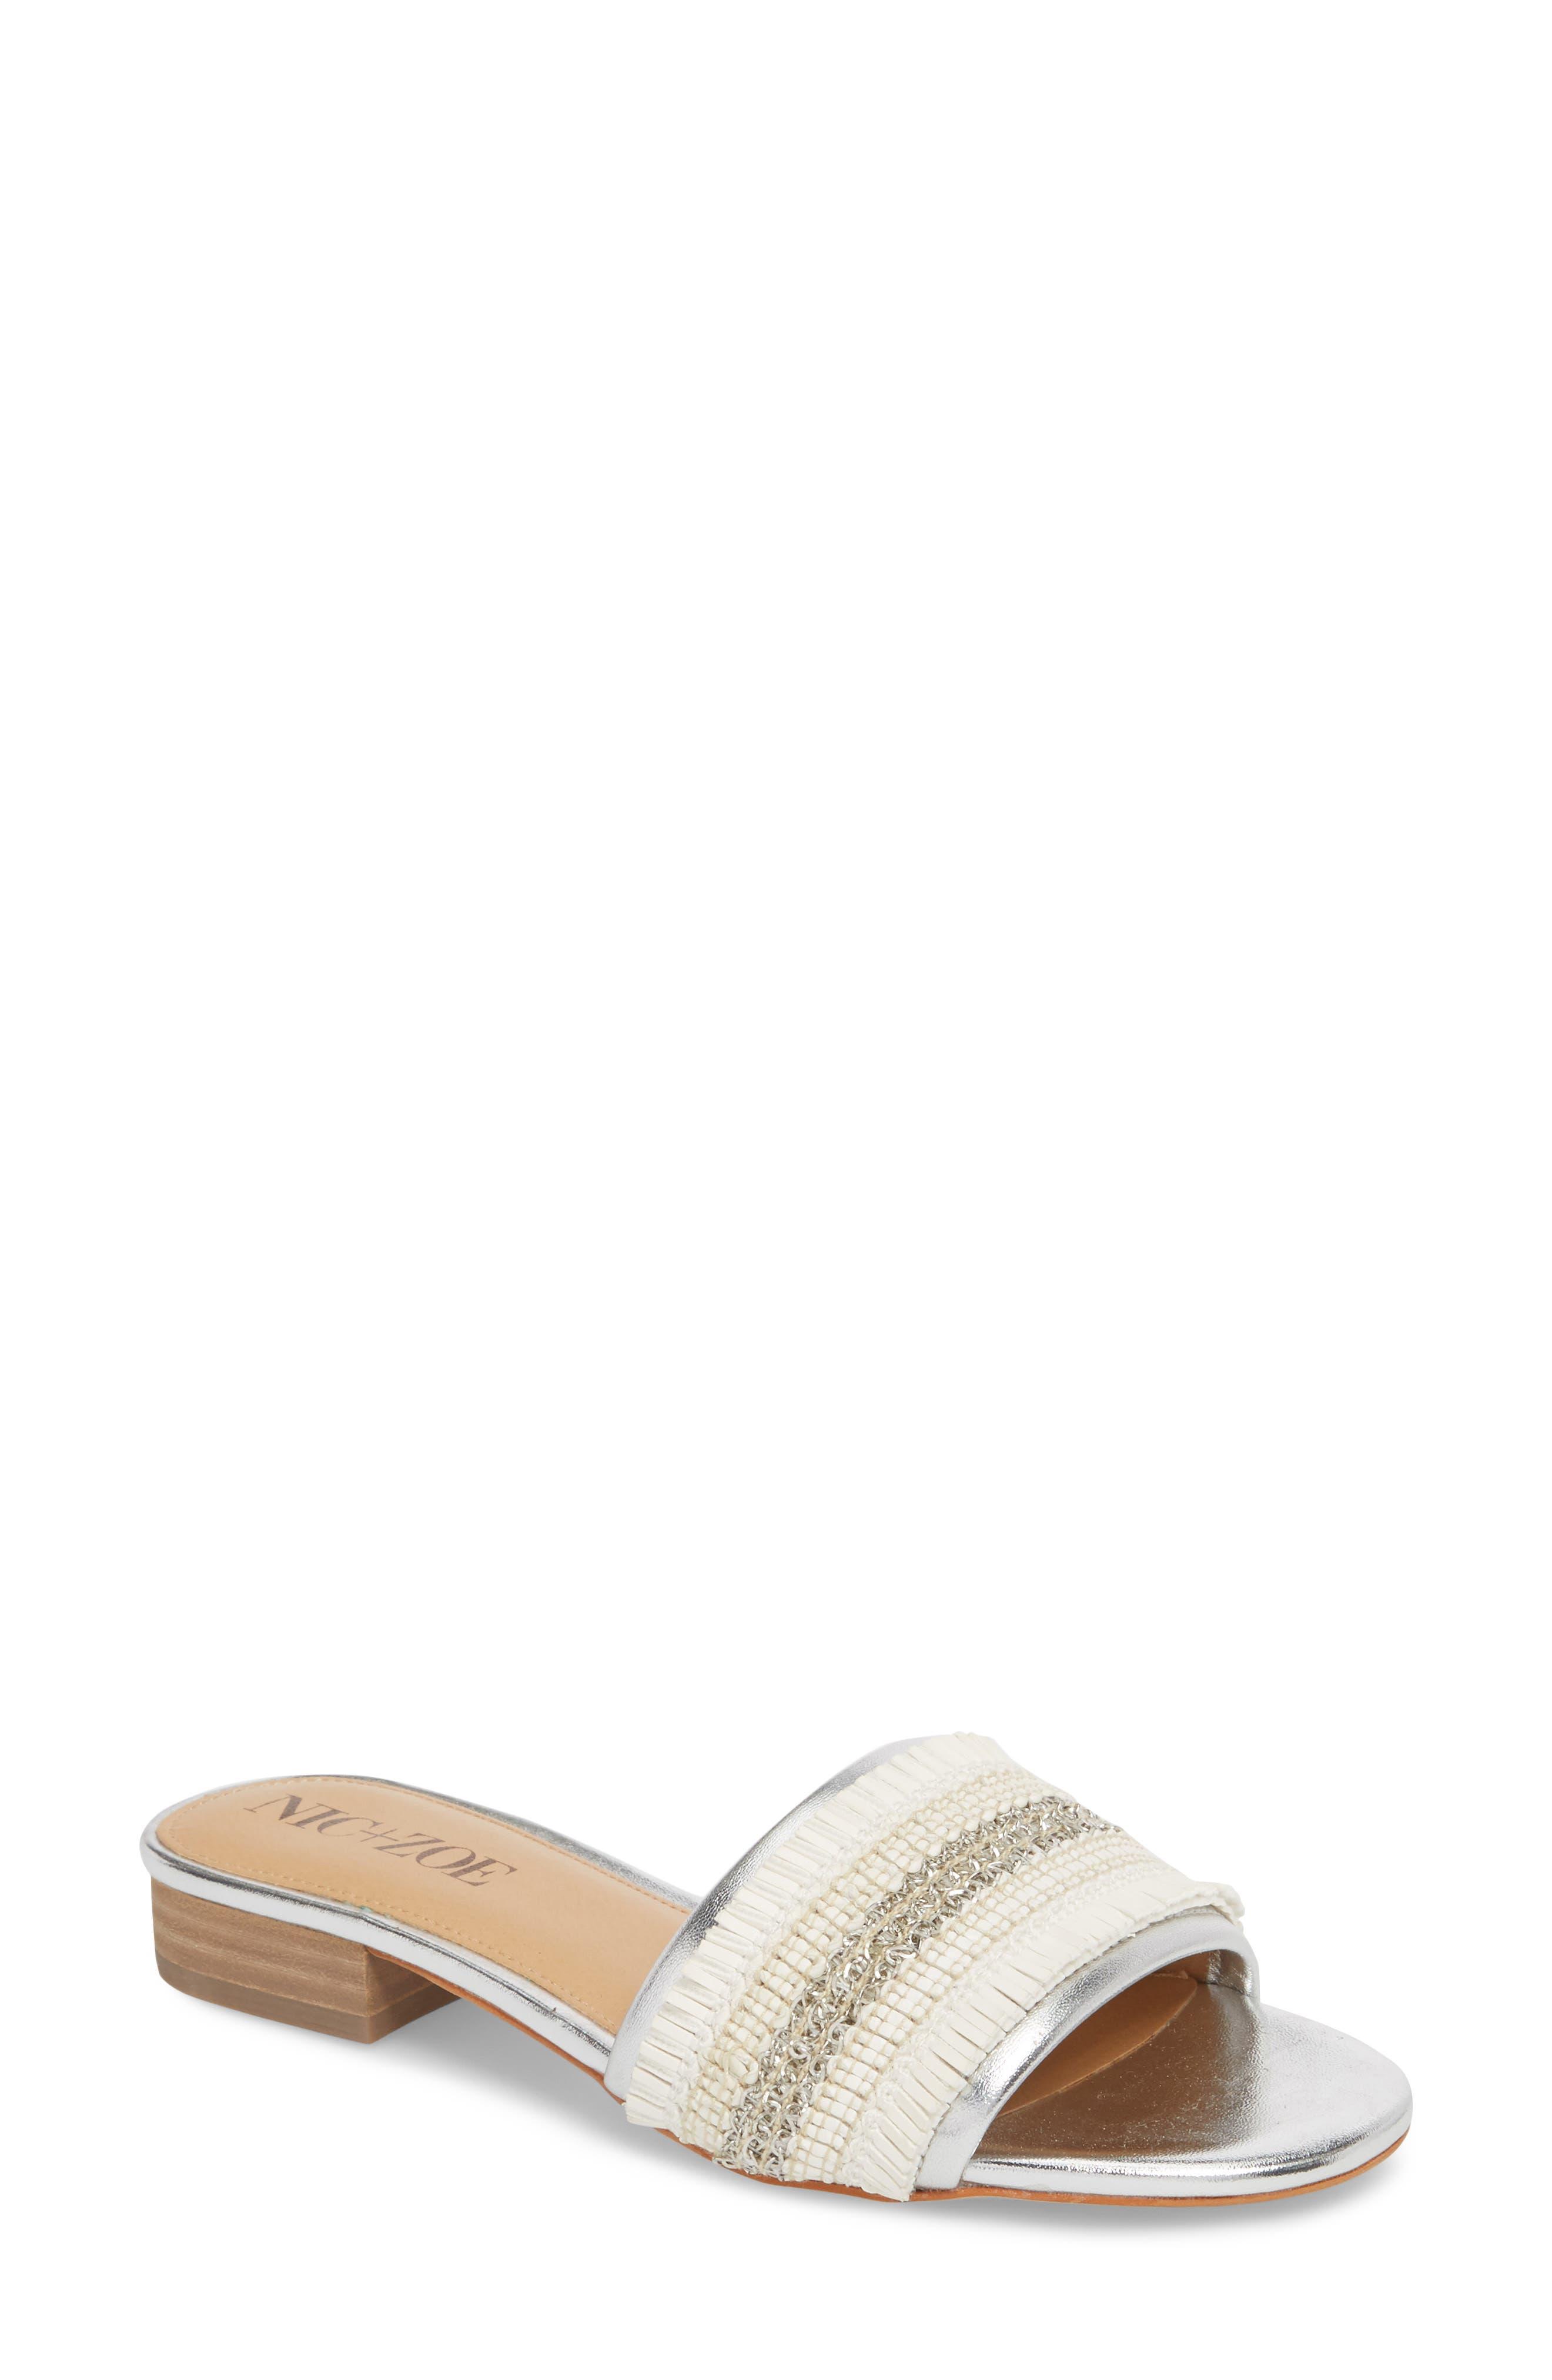 NIC + ZOE Sandy Slide Sandal,                         Main,                         color, SILVER/ WHITE FABRIC